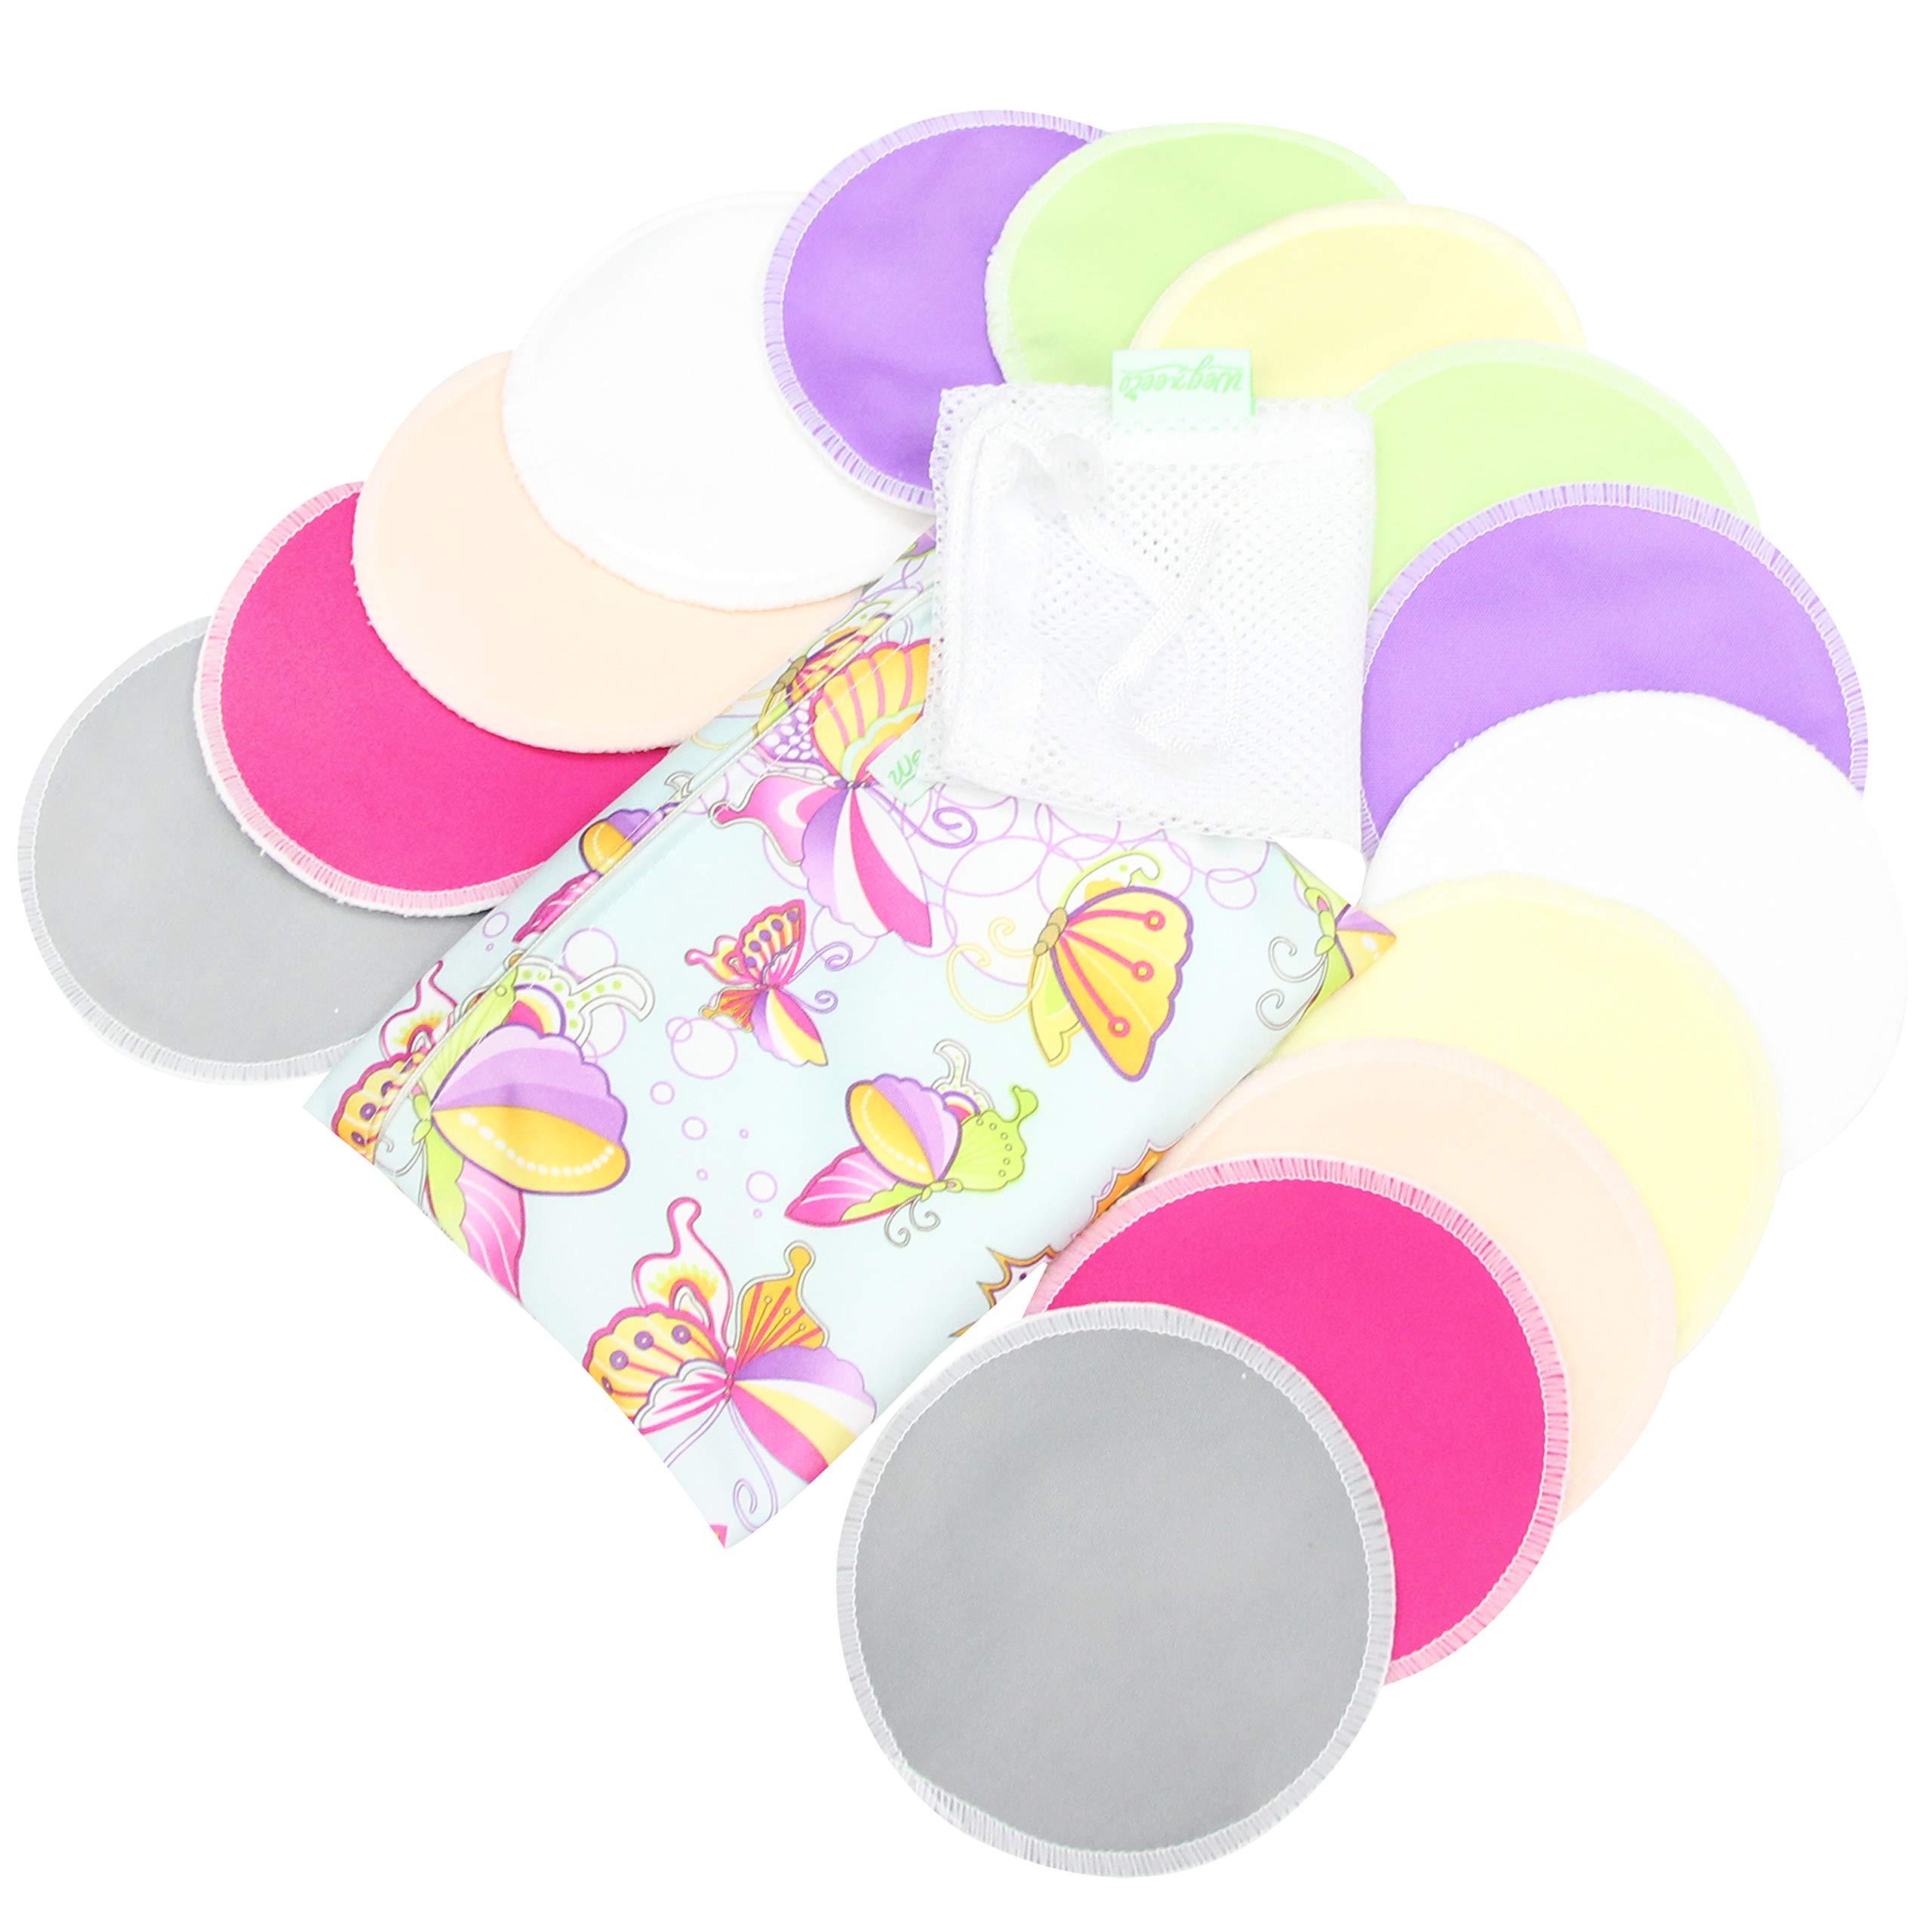 Bamboo Nursing Pads (14 Pack) + Laundry Bag & Travel Storage Bag, 2 Sizes: 3.9/4.7 inch Option – Washable & Reusable…